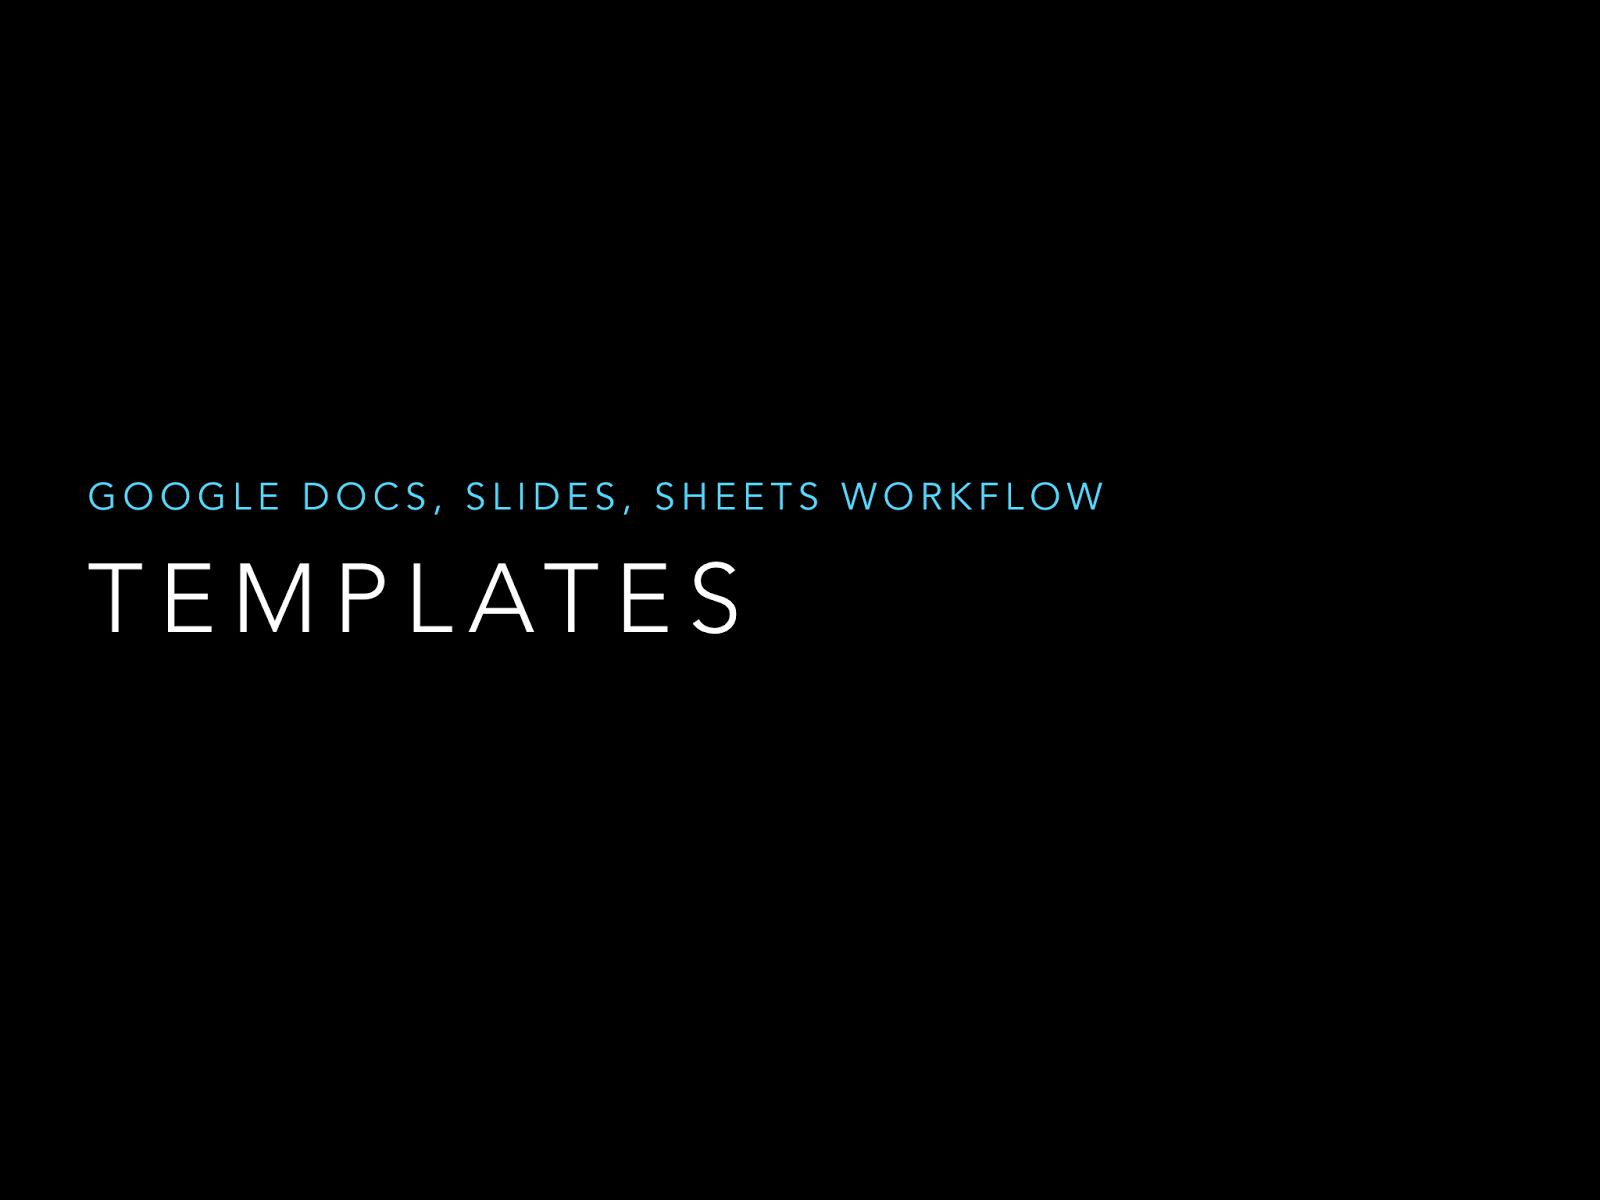 Google Docs Slides Sheets Templates Workflow On IPads